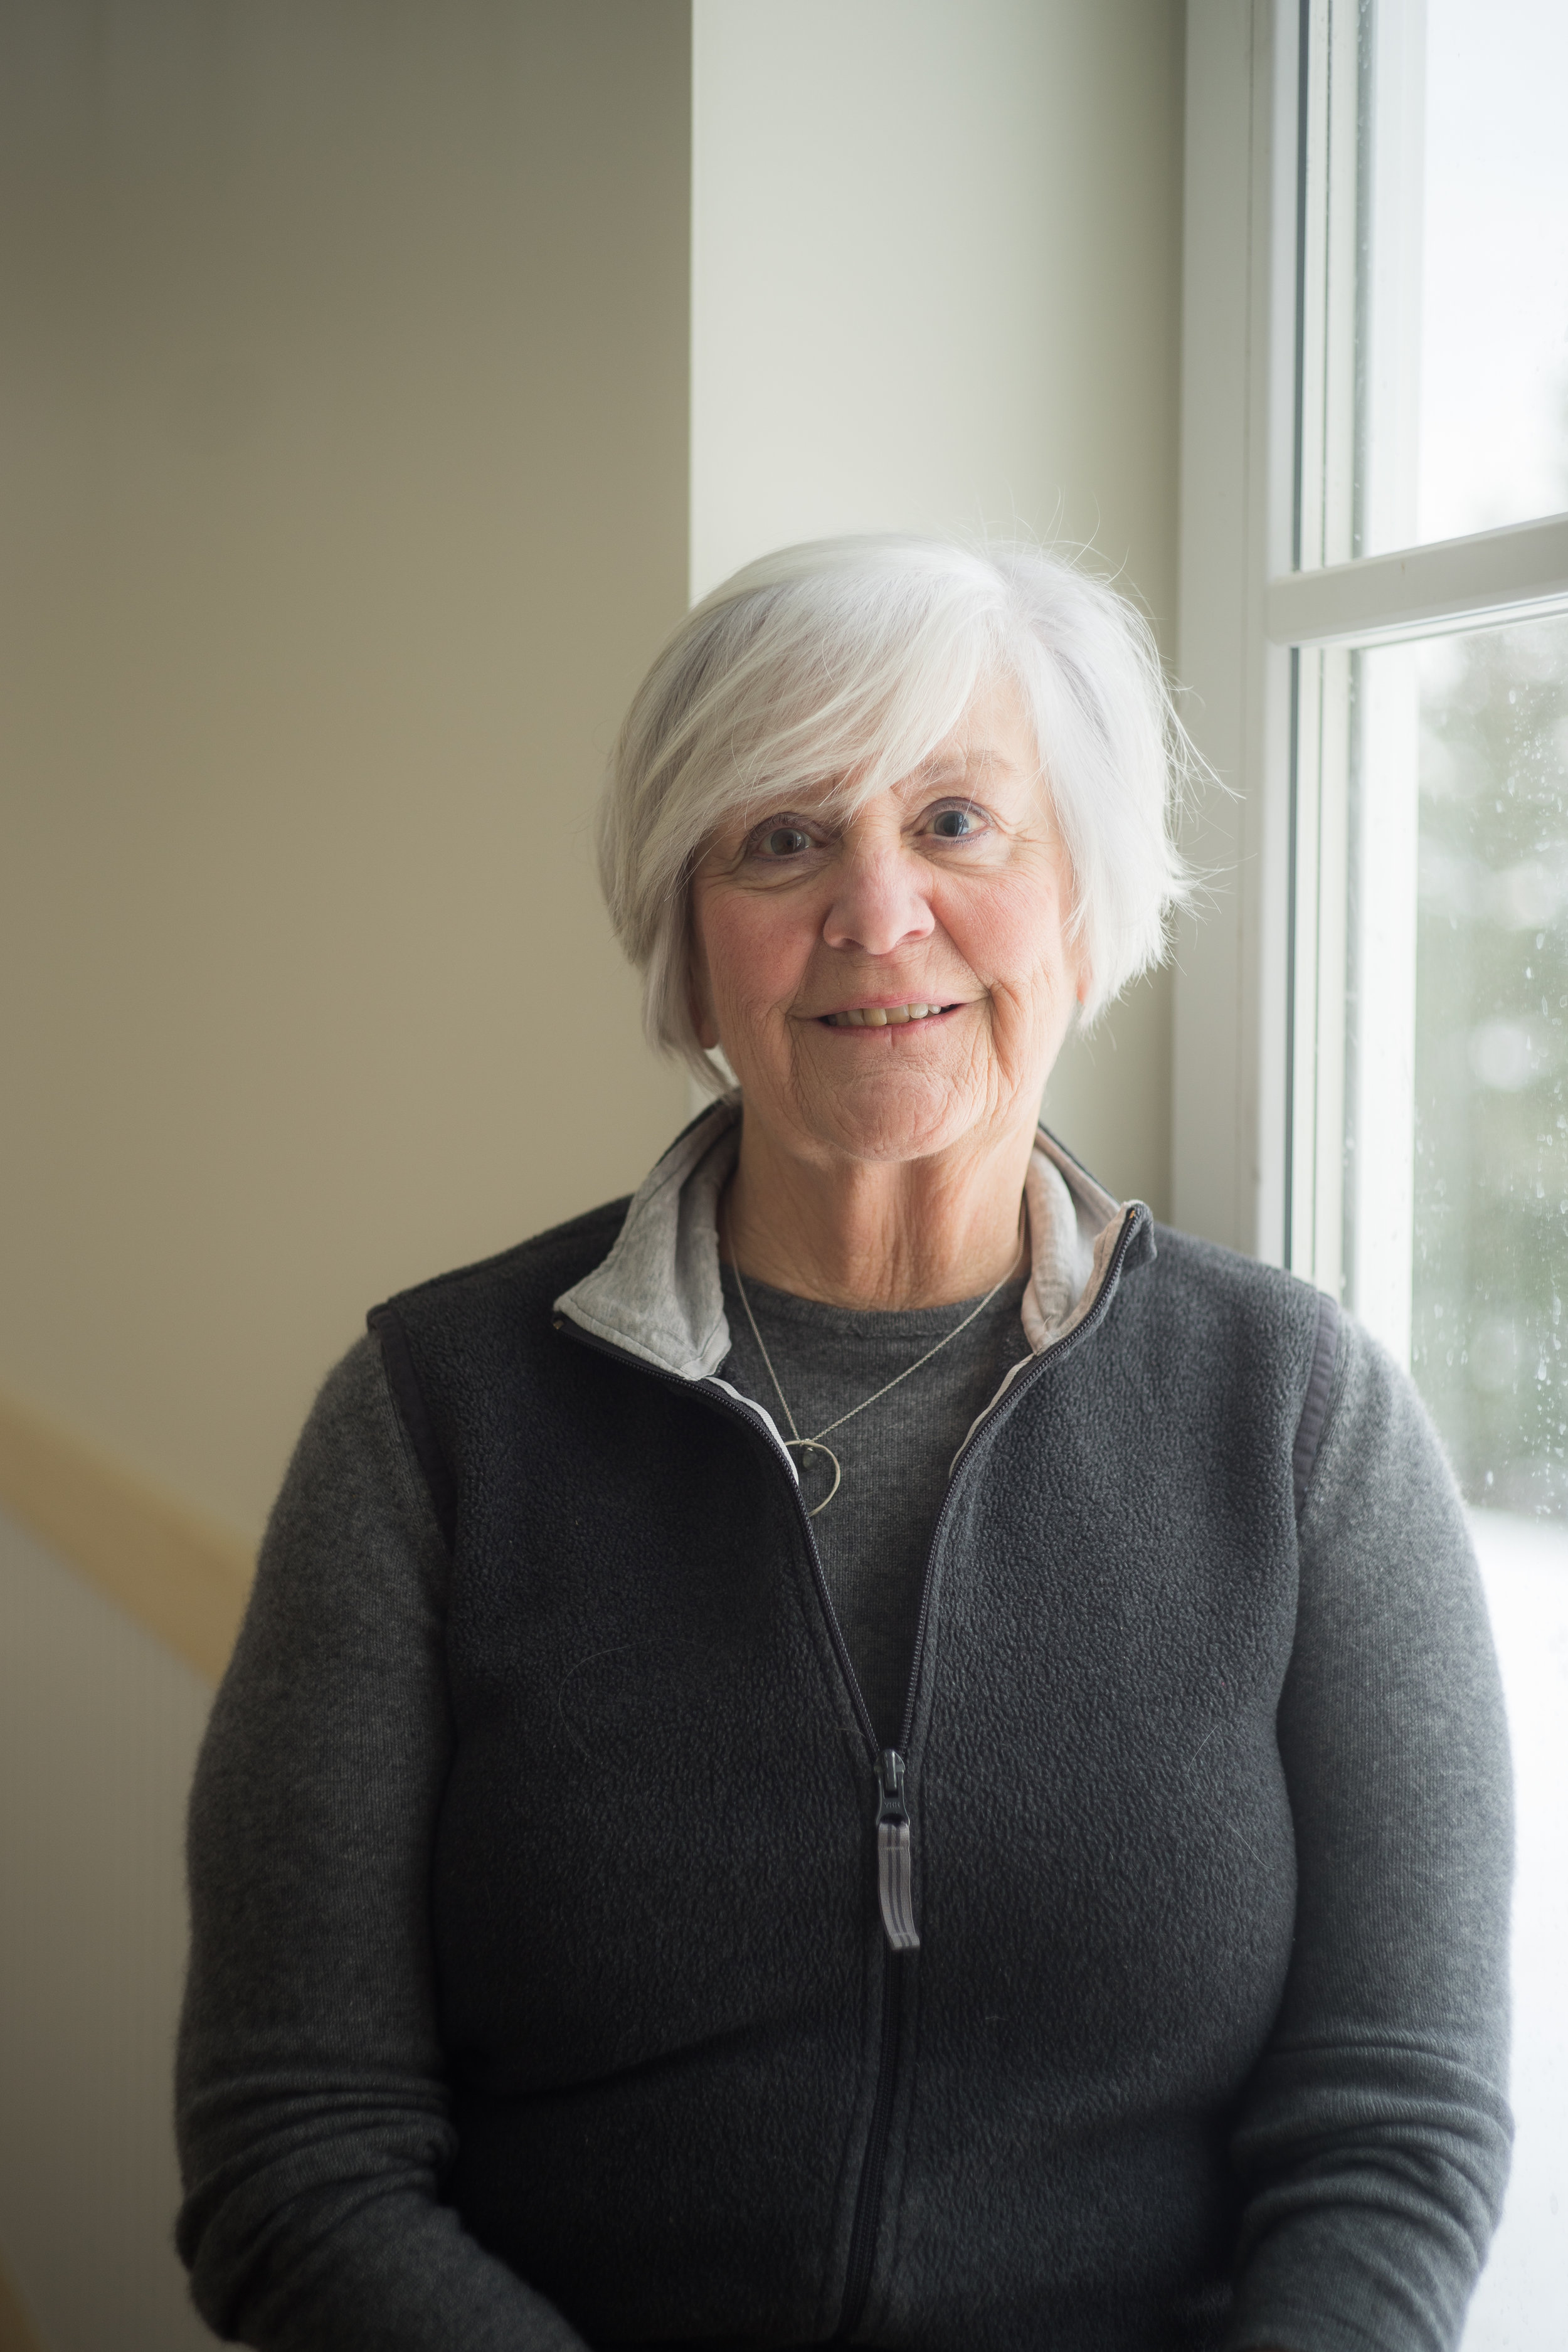 Lisa Shields, Secretary